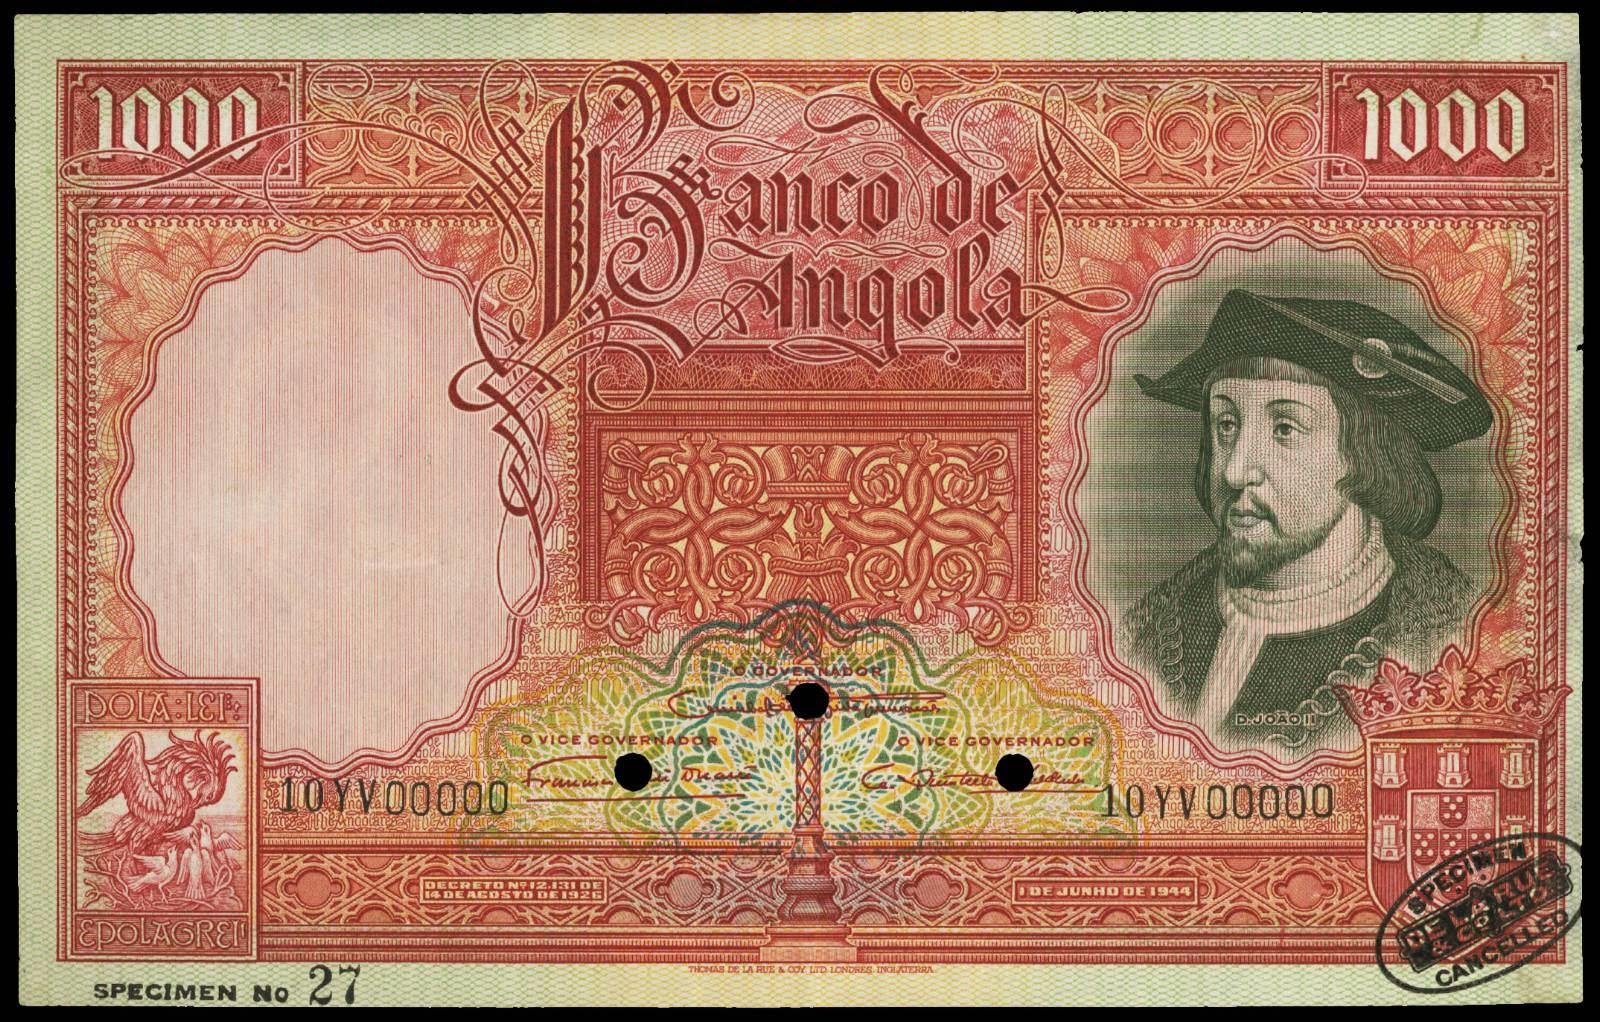 Angola banknotes 1000 Angolares note 1944 King Joao II